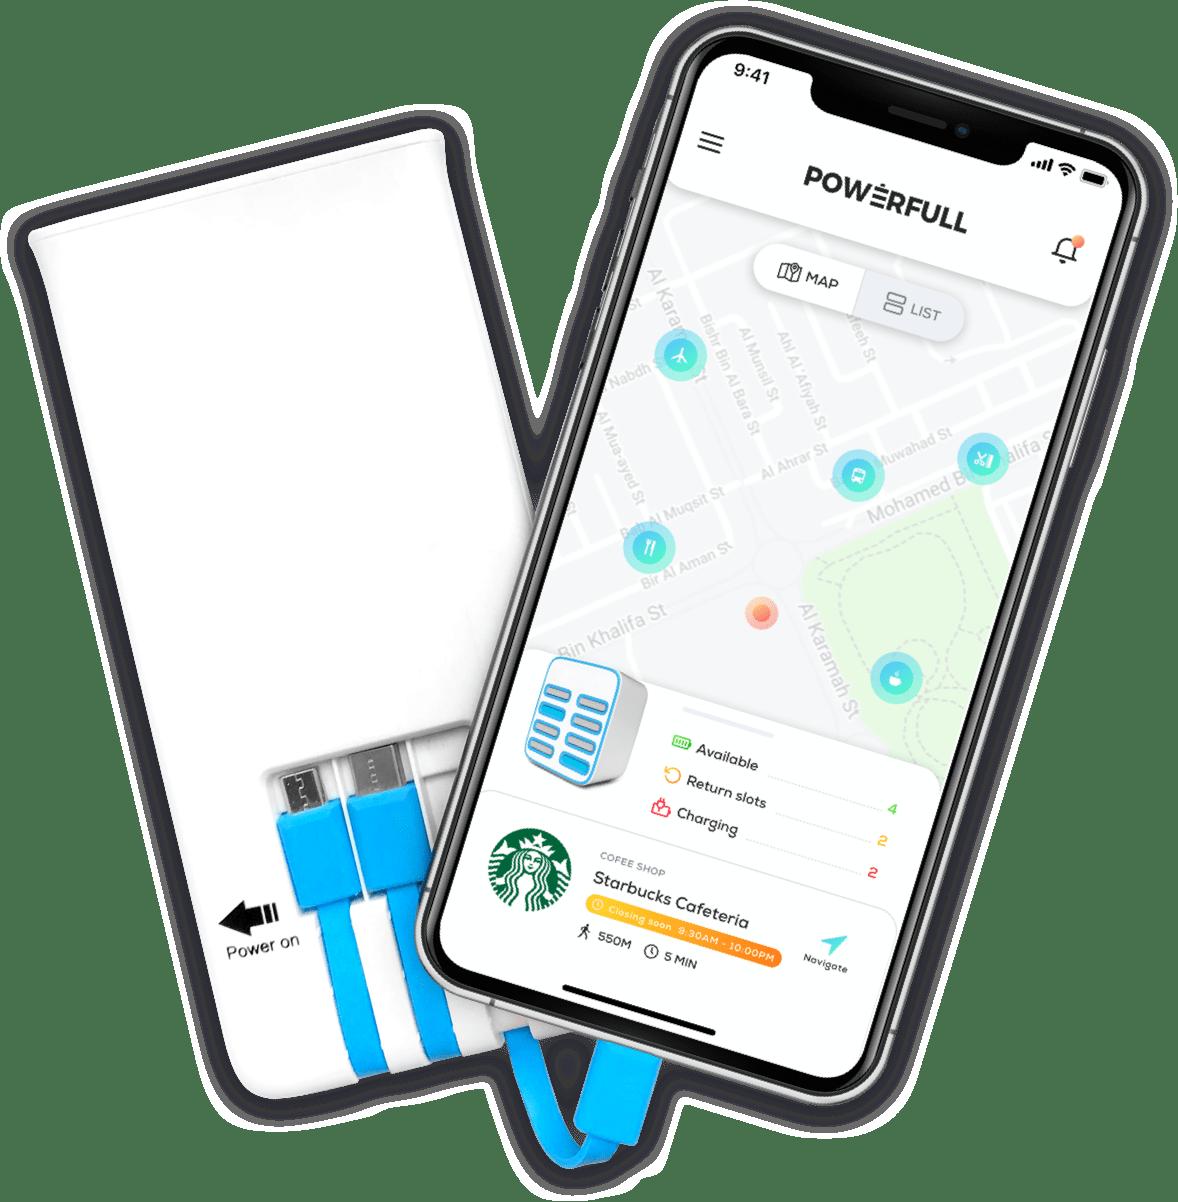 powerbank and phone